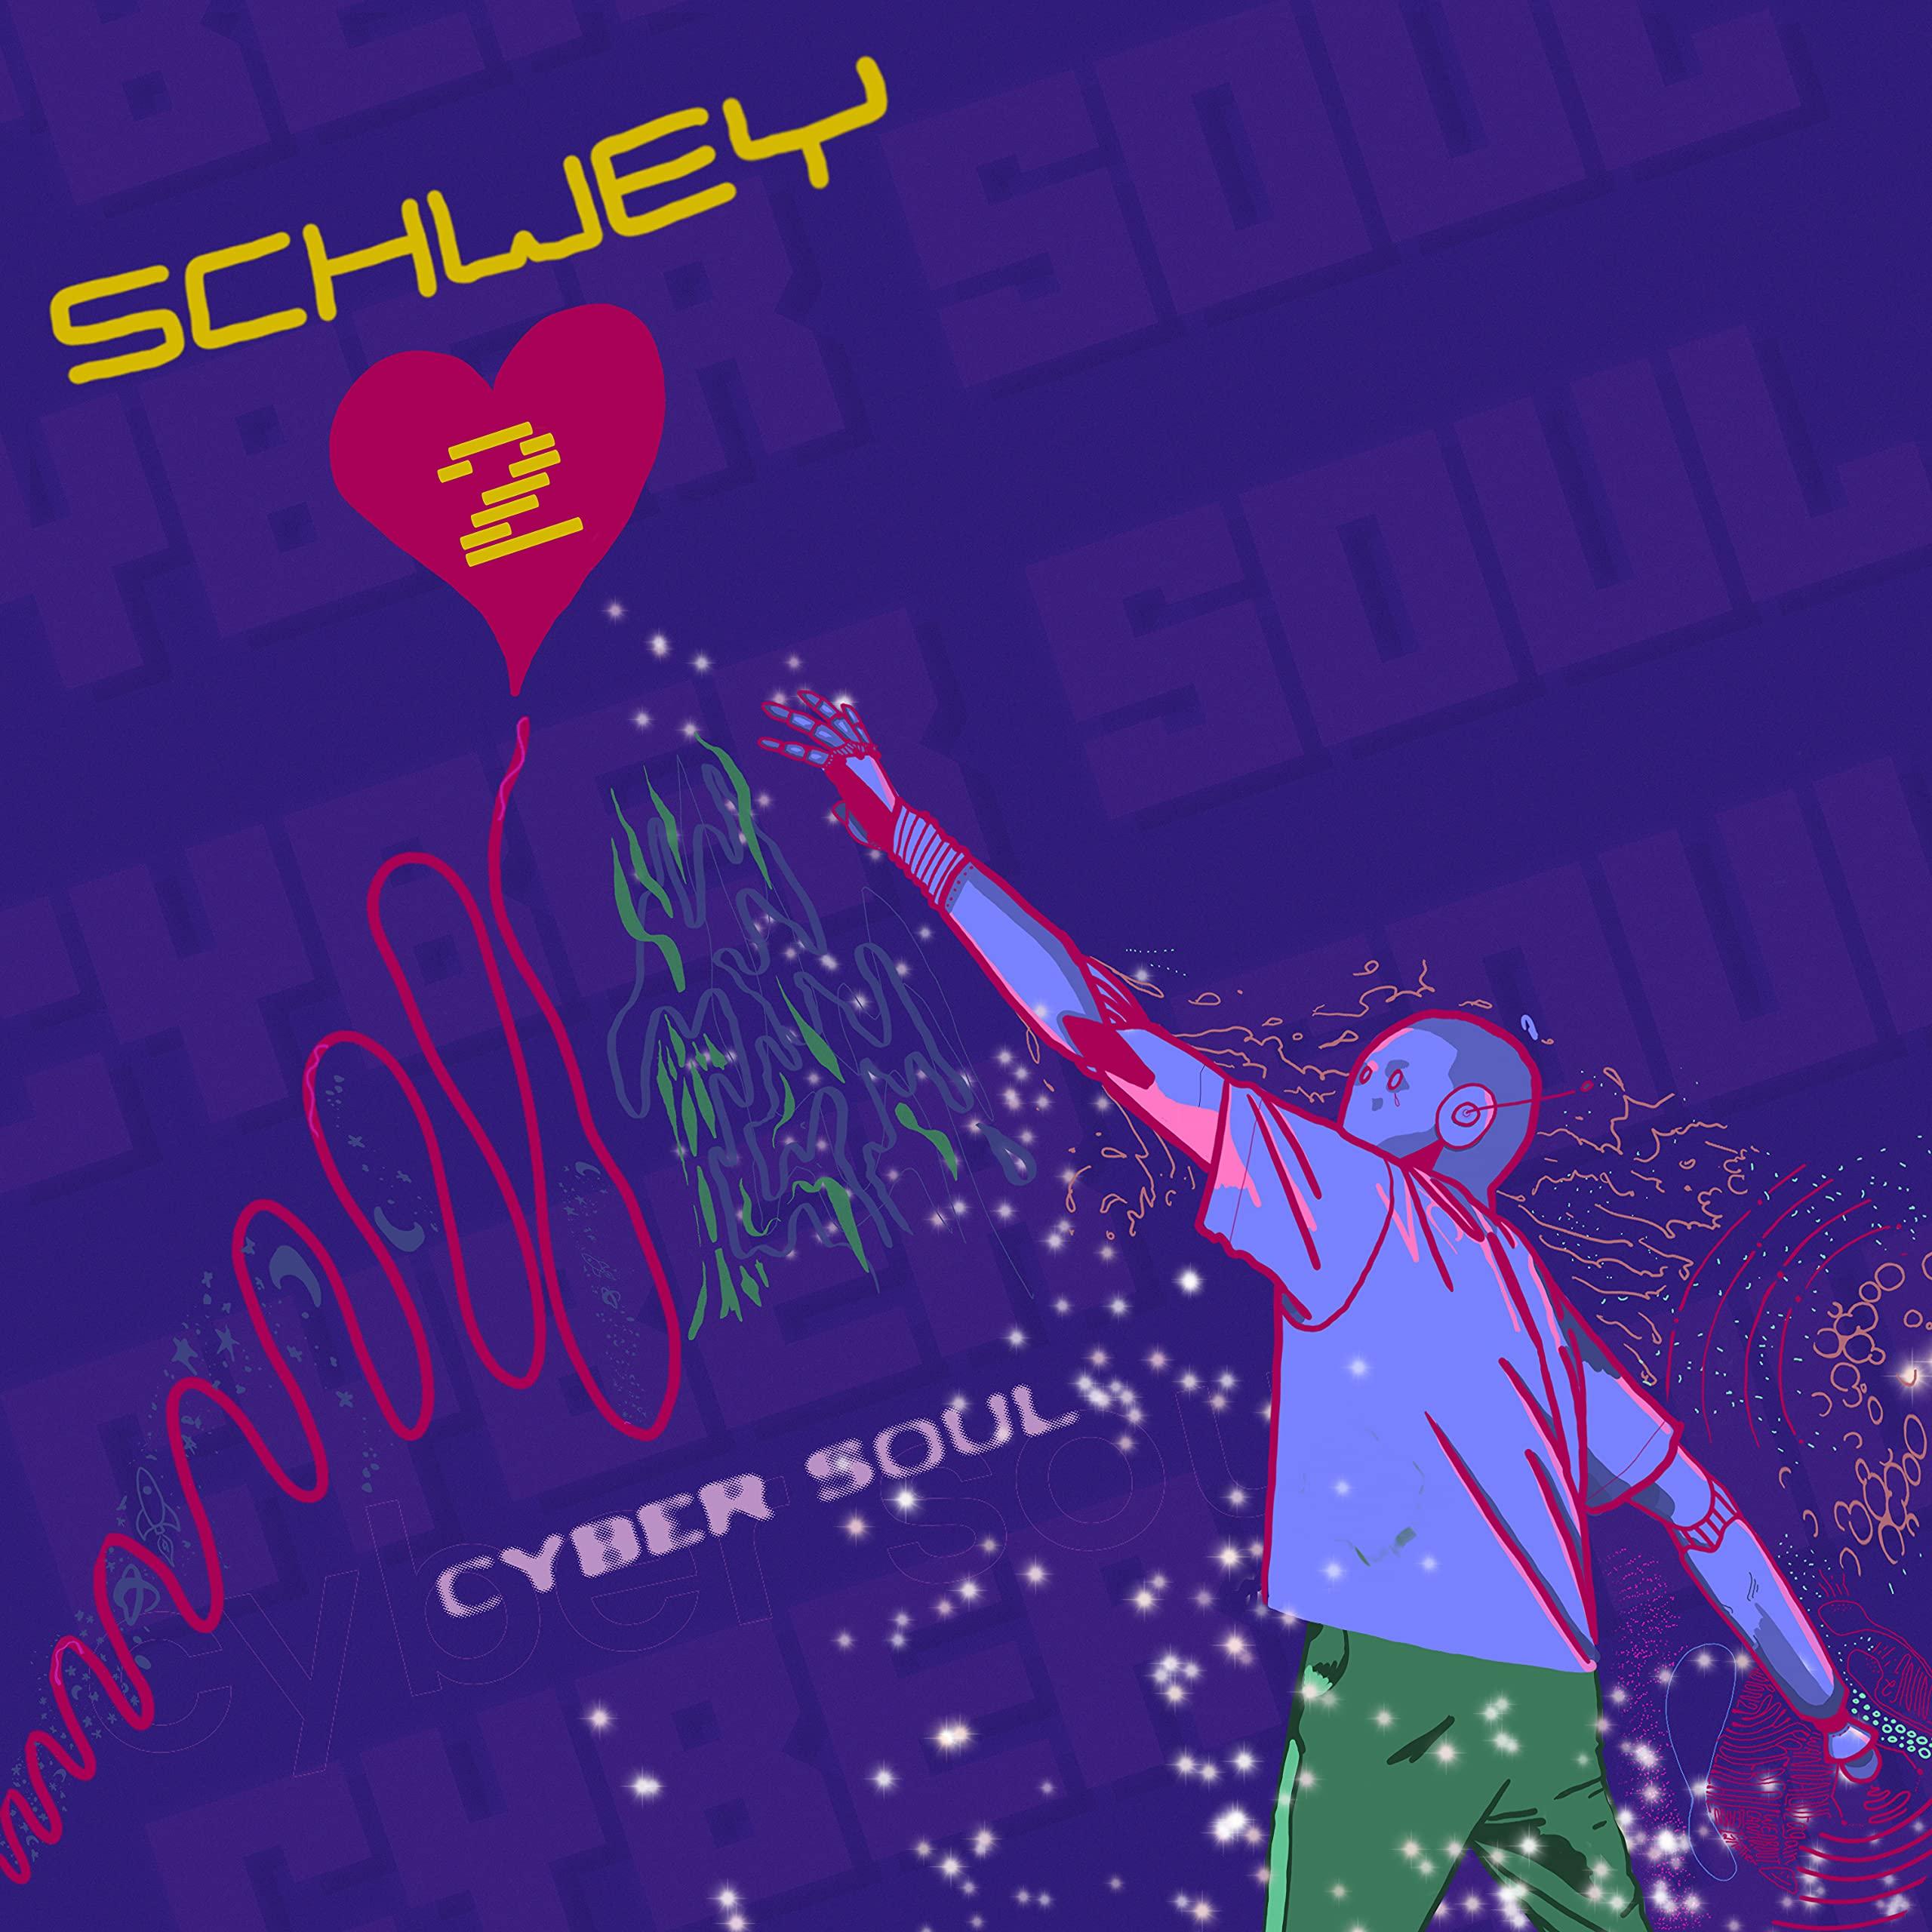 Schwey - Schwey 2: Cyber Soul (2021) [FLAC] Download